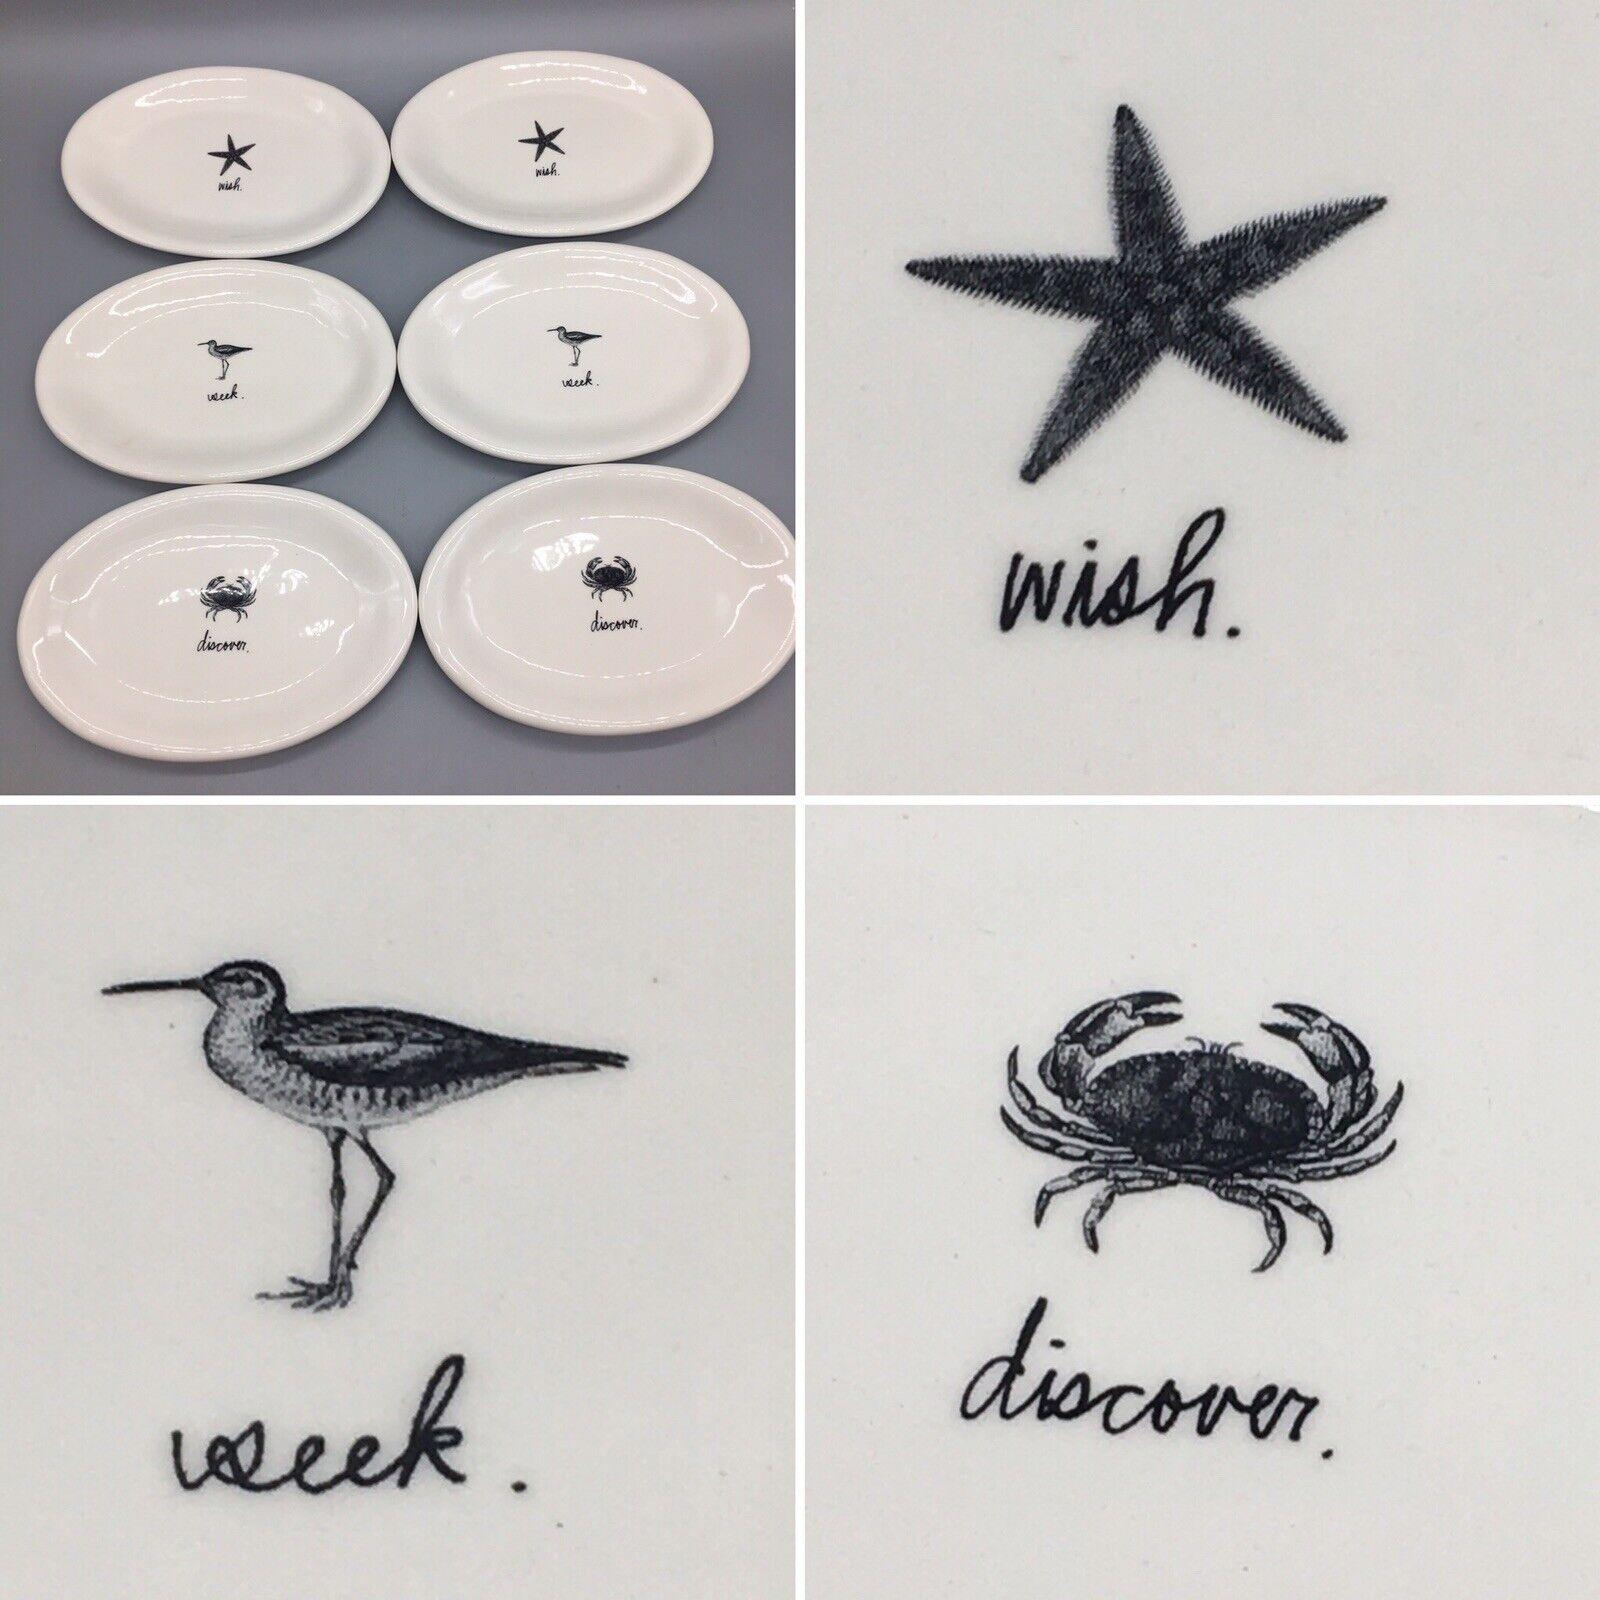 X6 Rae Dunn Oval Appetizer Plate Set Starfish Crab Sea Bird Seek Discover Wish